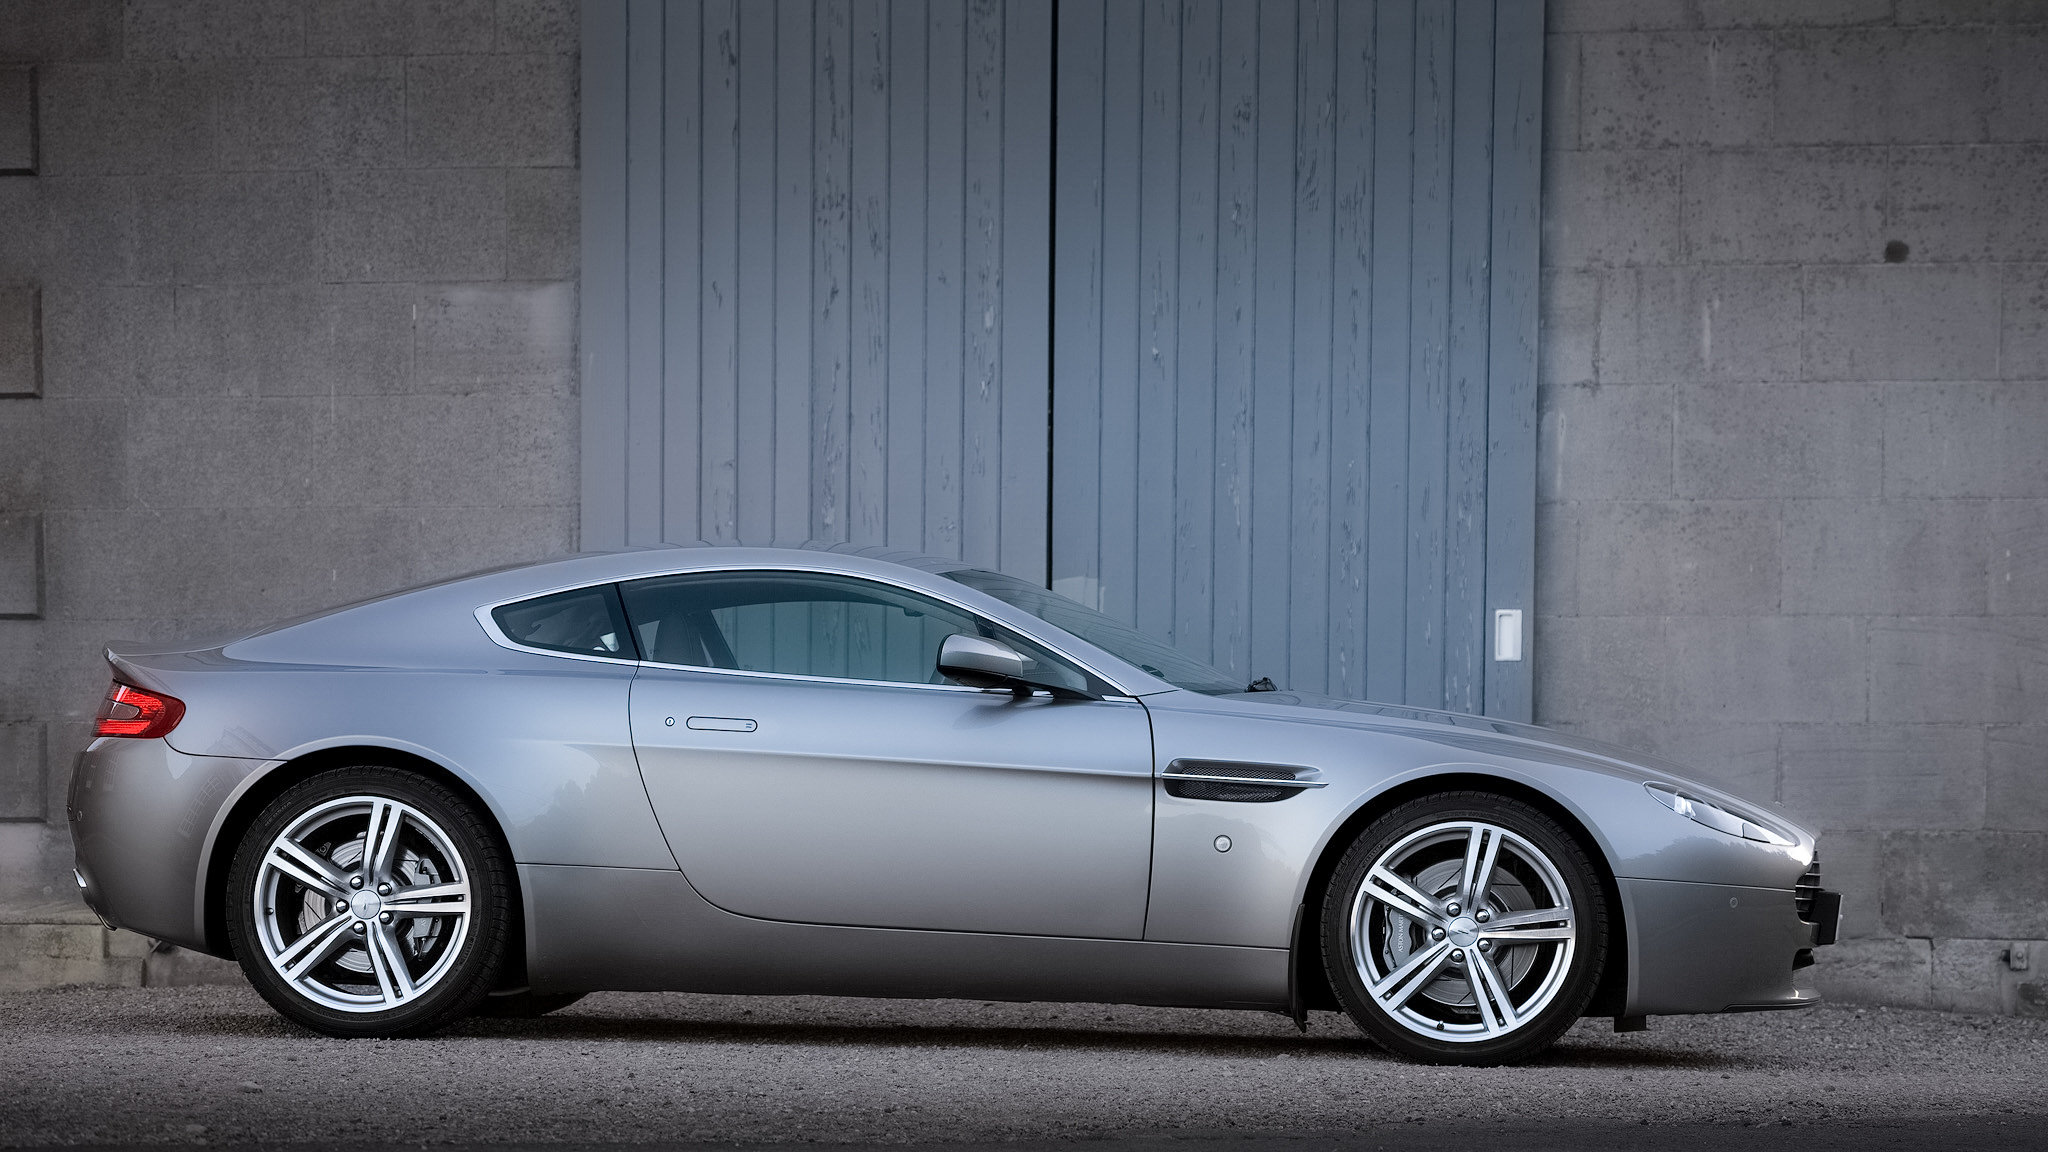 2009 Aston Martin Vantage 4.7 V8 For Sale (picture 3 of 6)